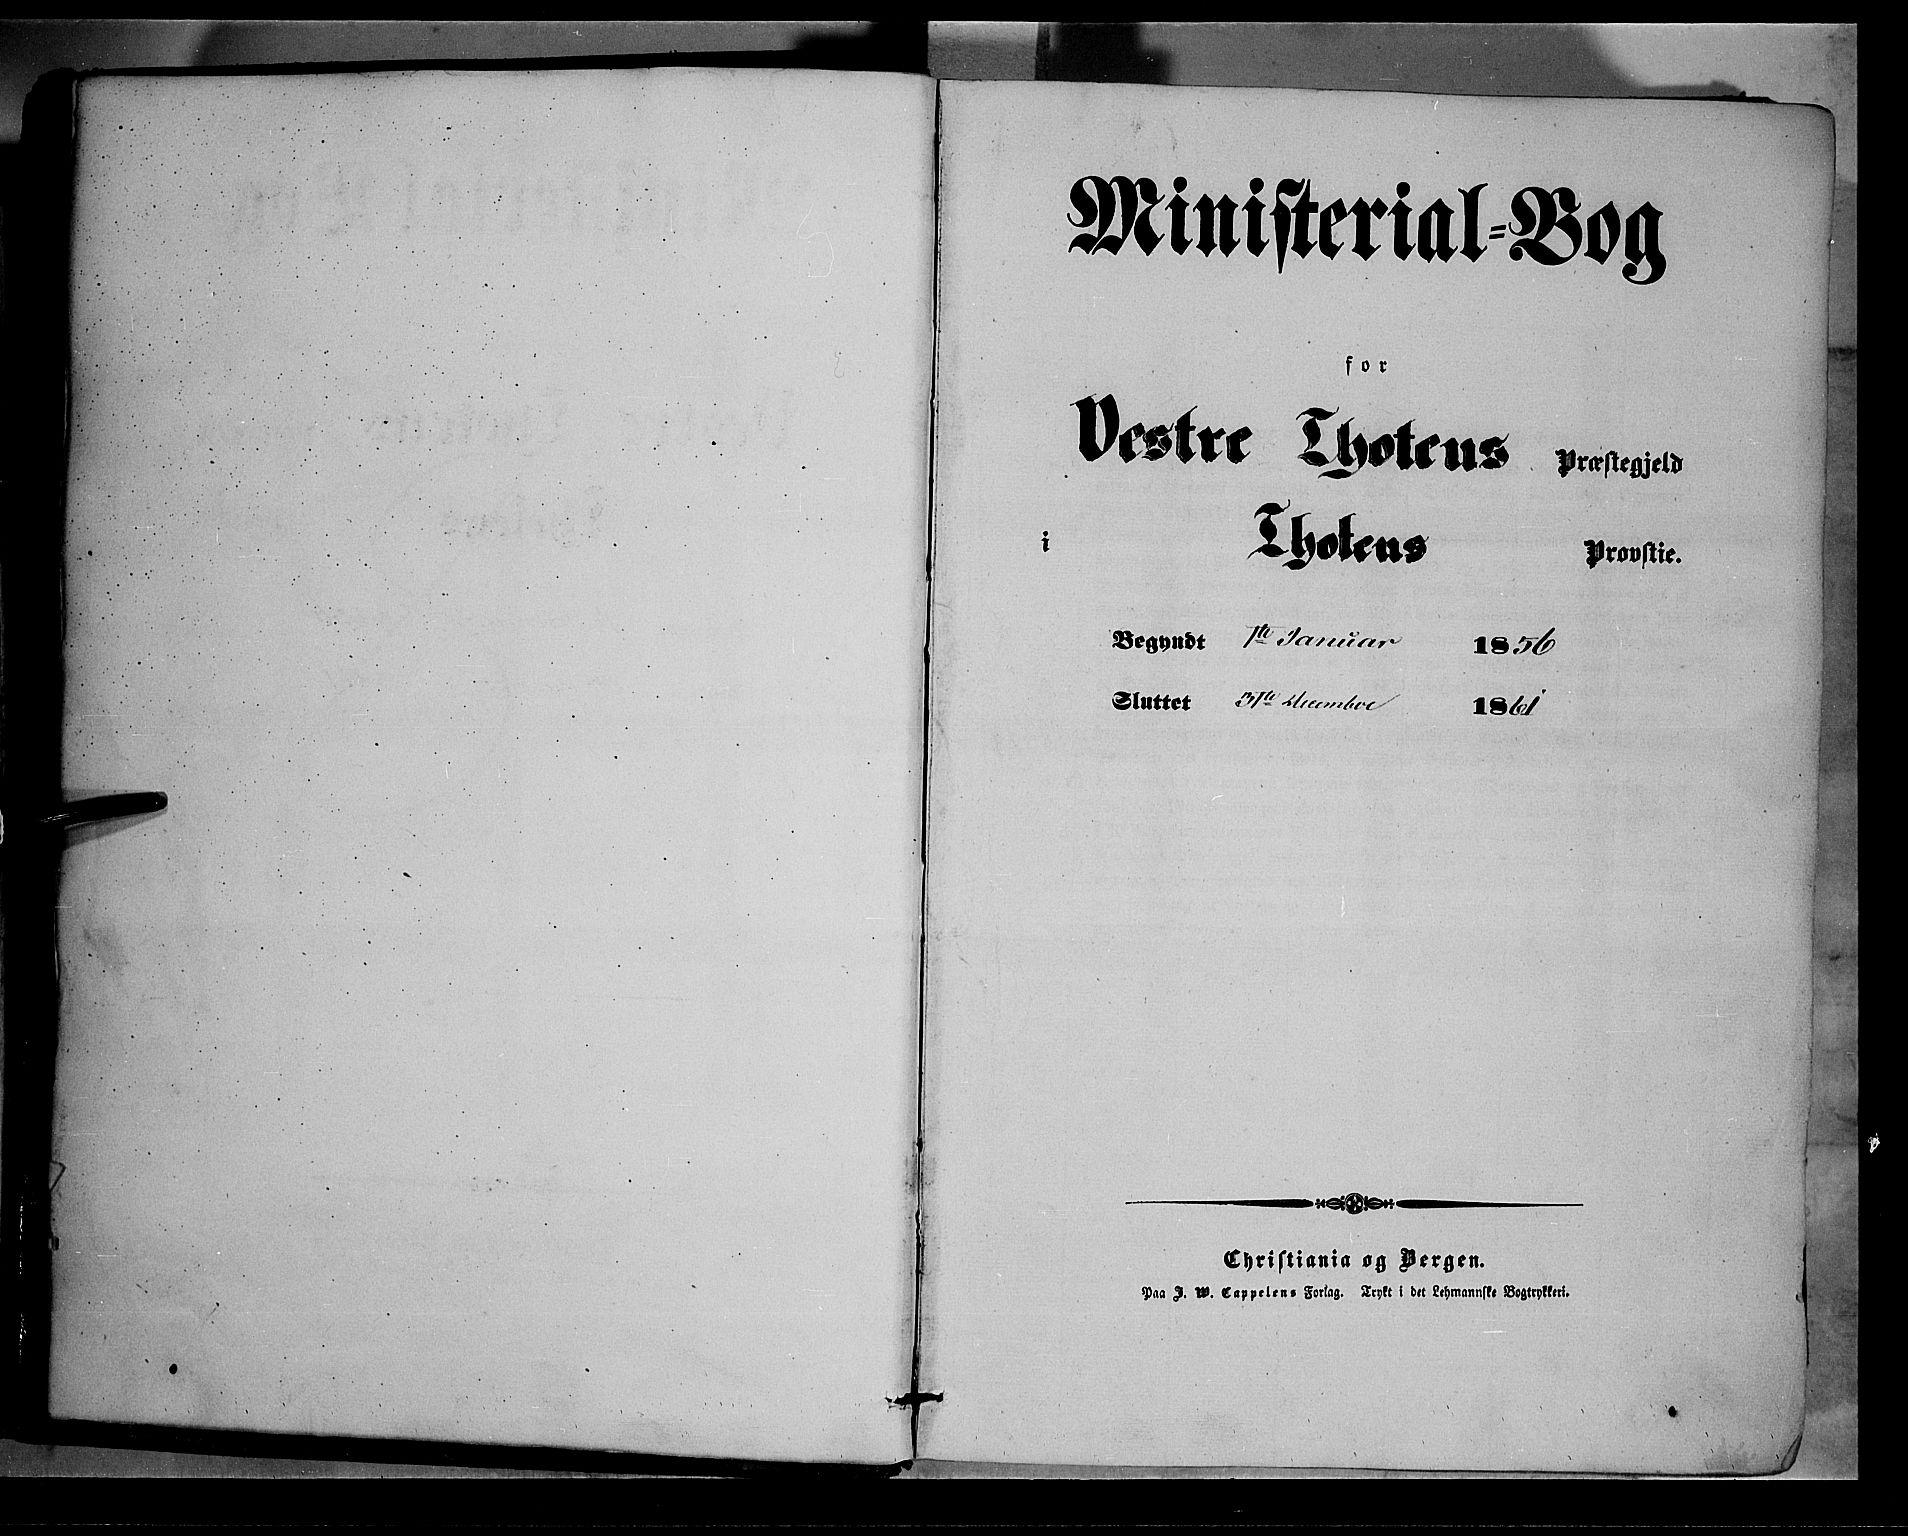 SAH, Vestre Toten prestekontor, H/Ha/Haa/L0006: Ministerialbok nr. 6, 1856-1861